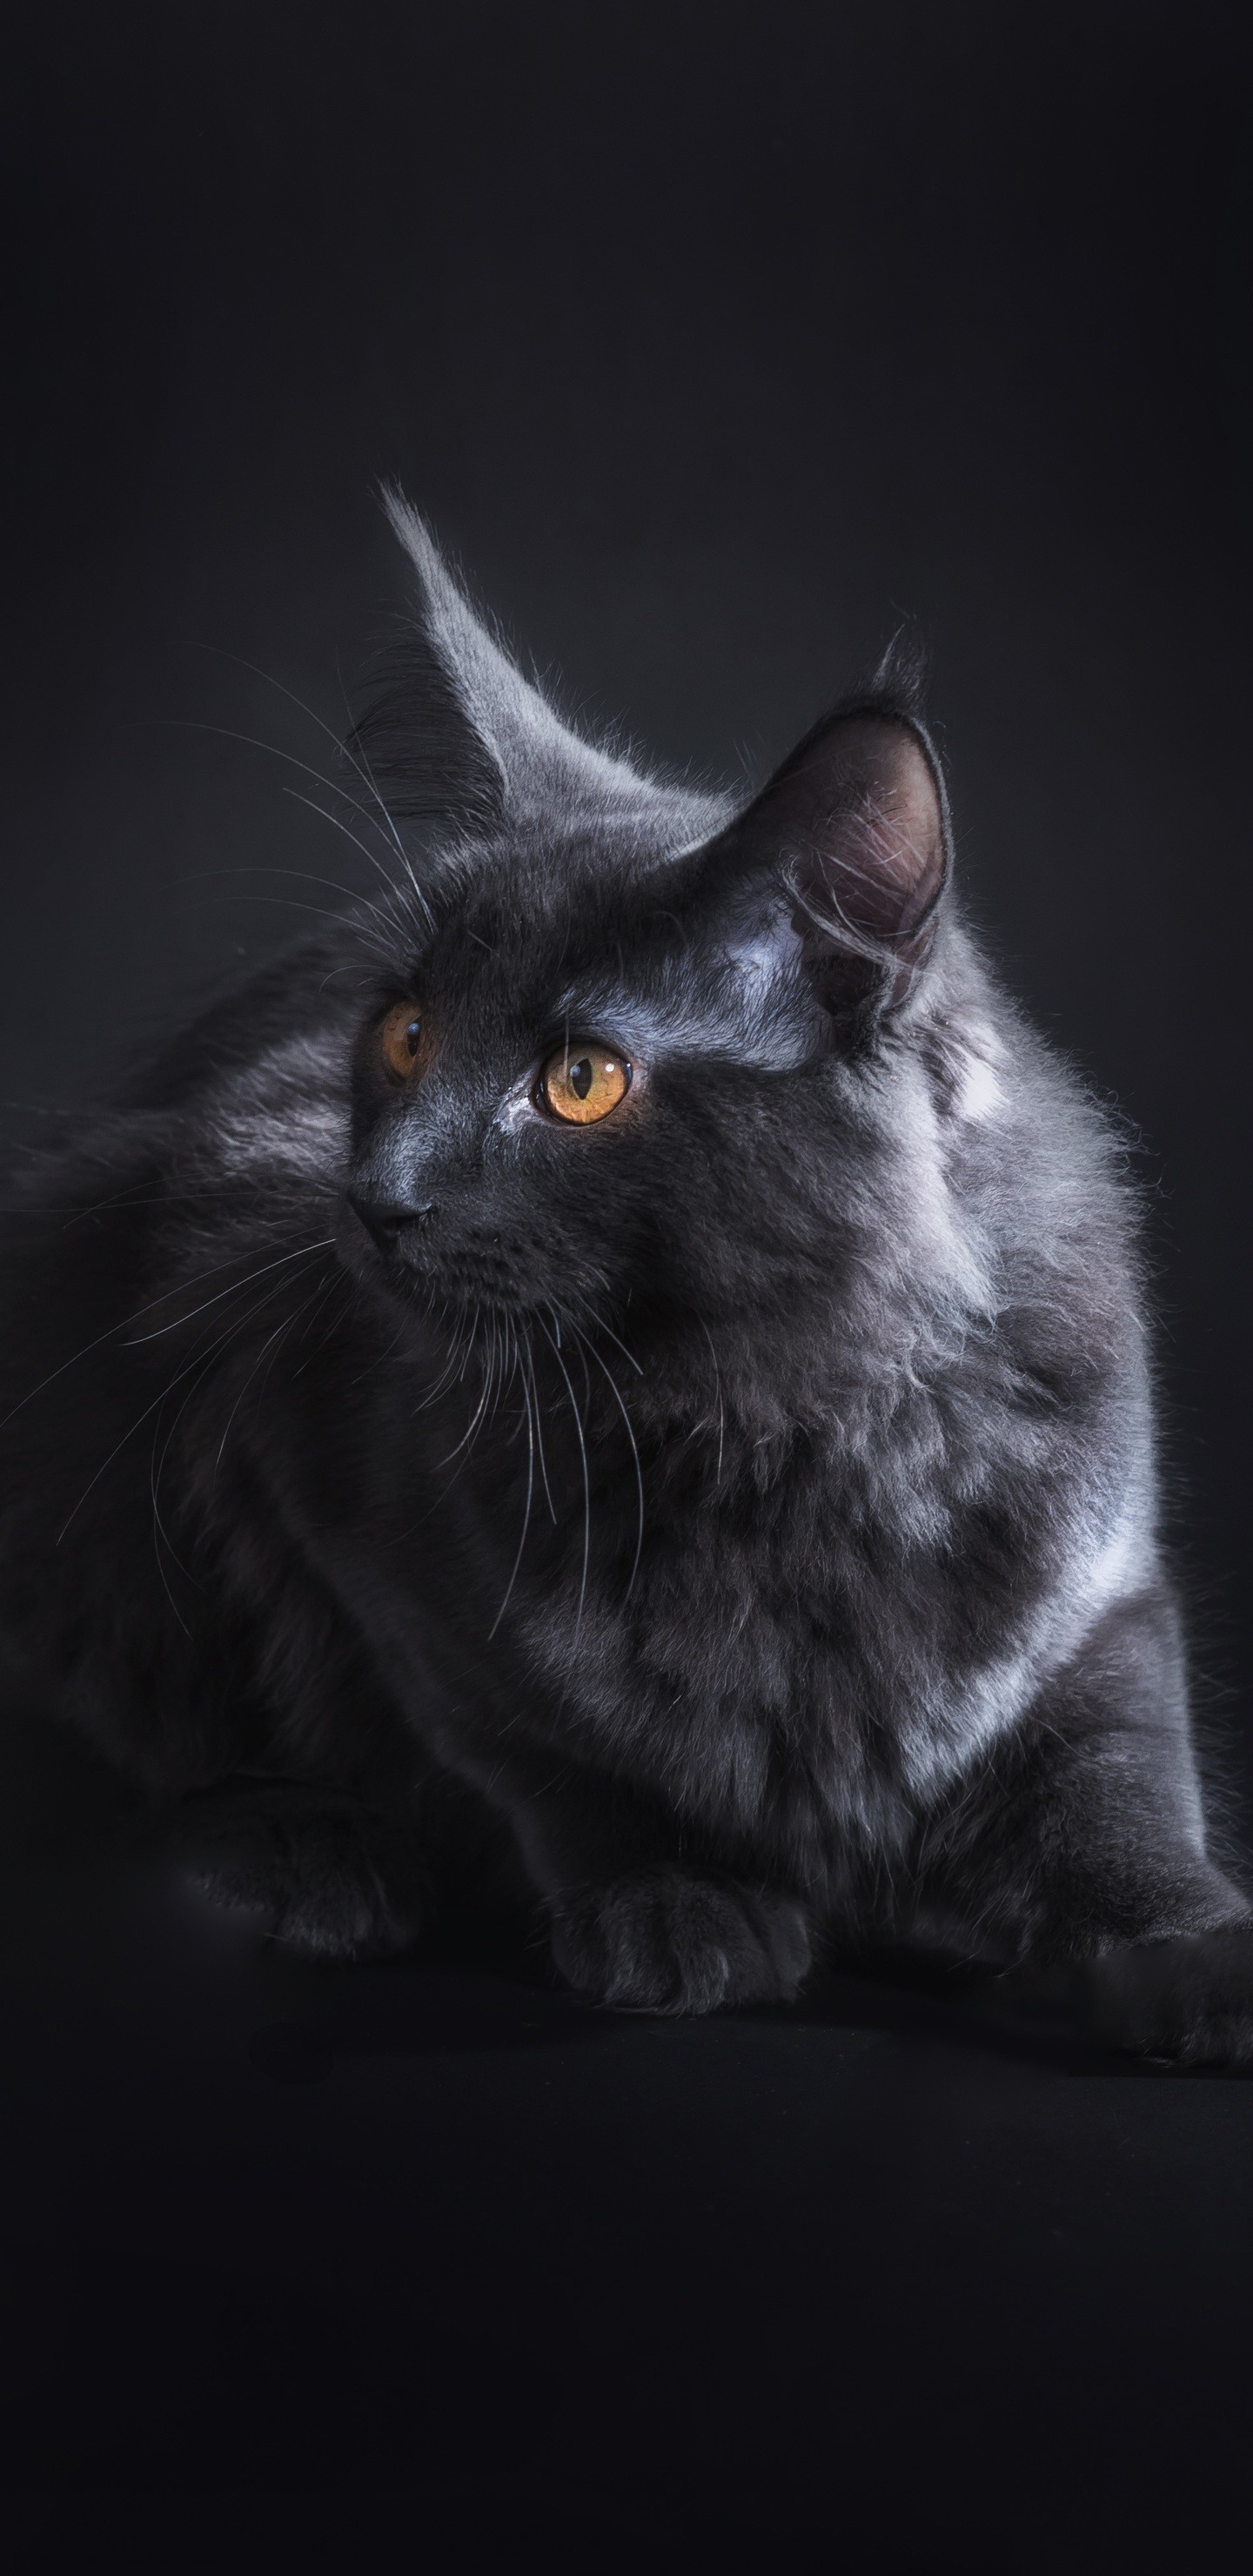 Res: 1440x2960, black-cat-5k-pk.jpg